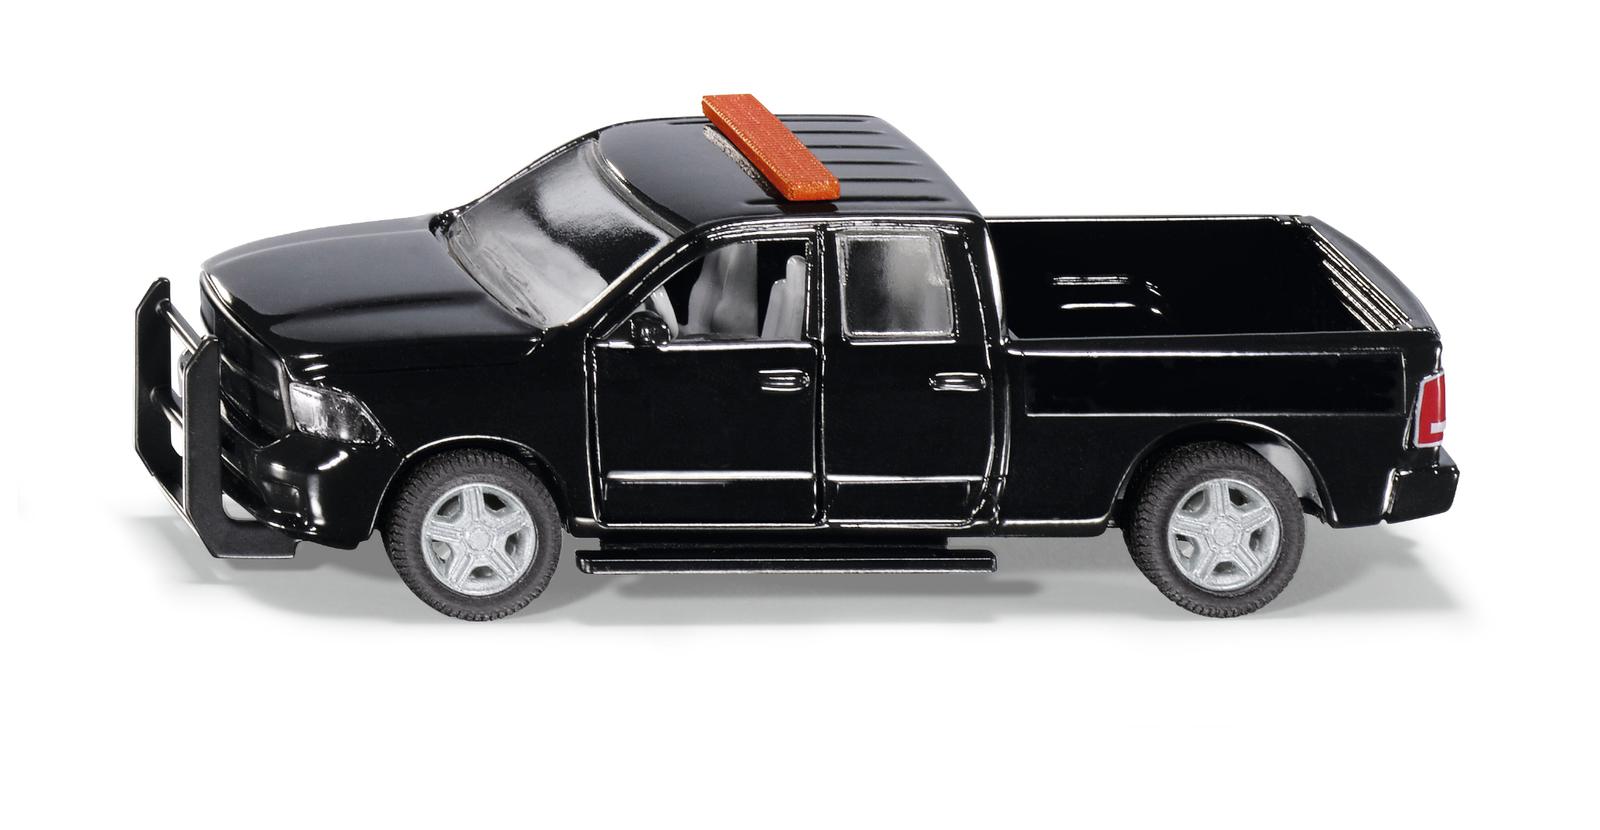 Siku: 1:50 Dodge RAM 1500 US Police Ute image